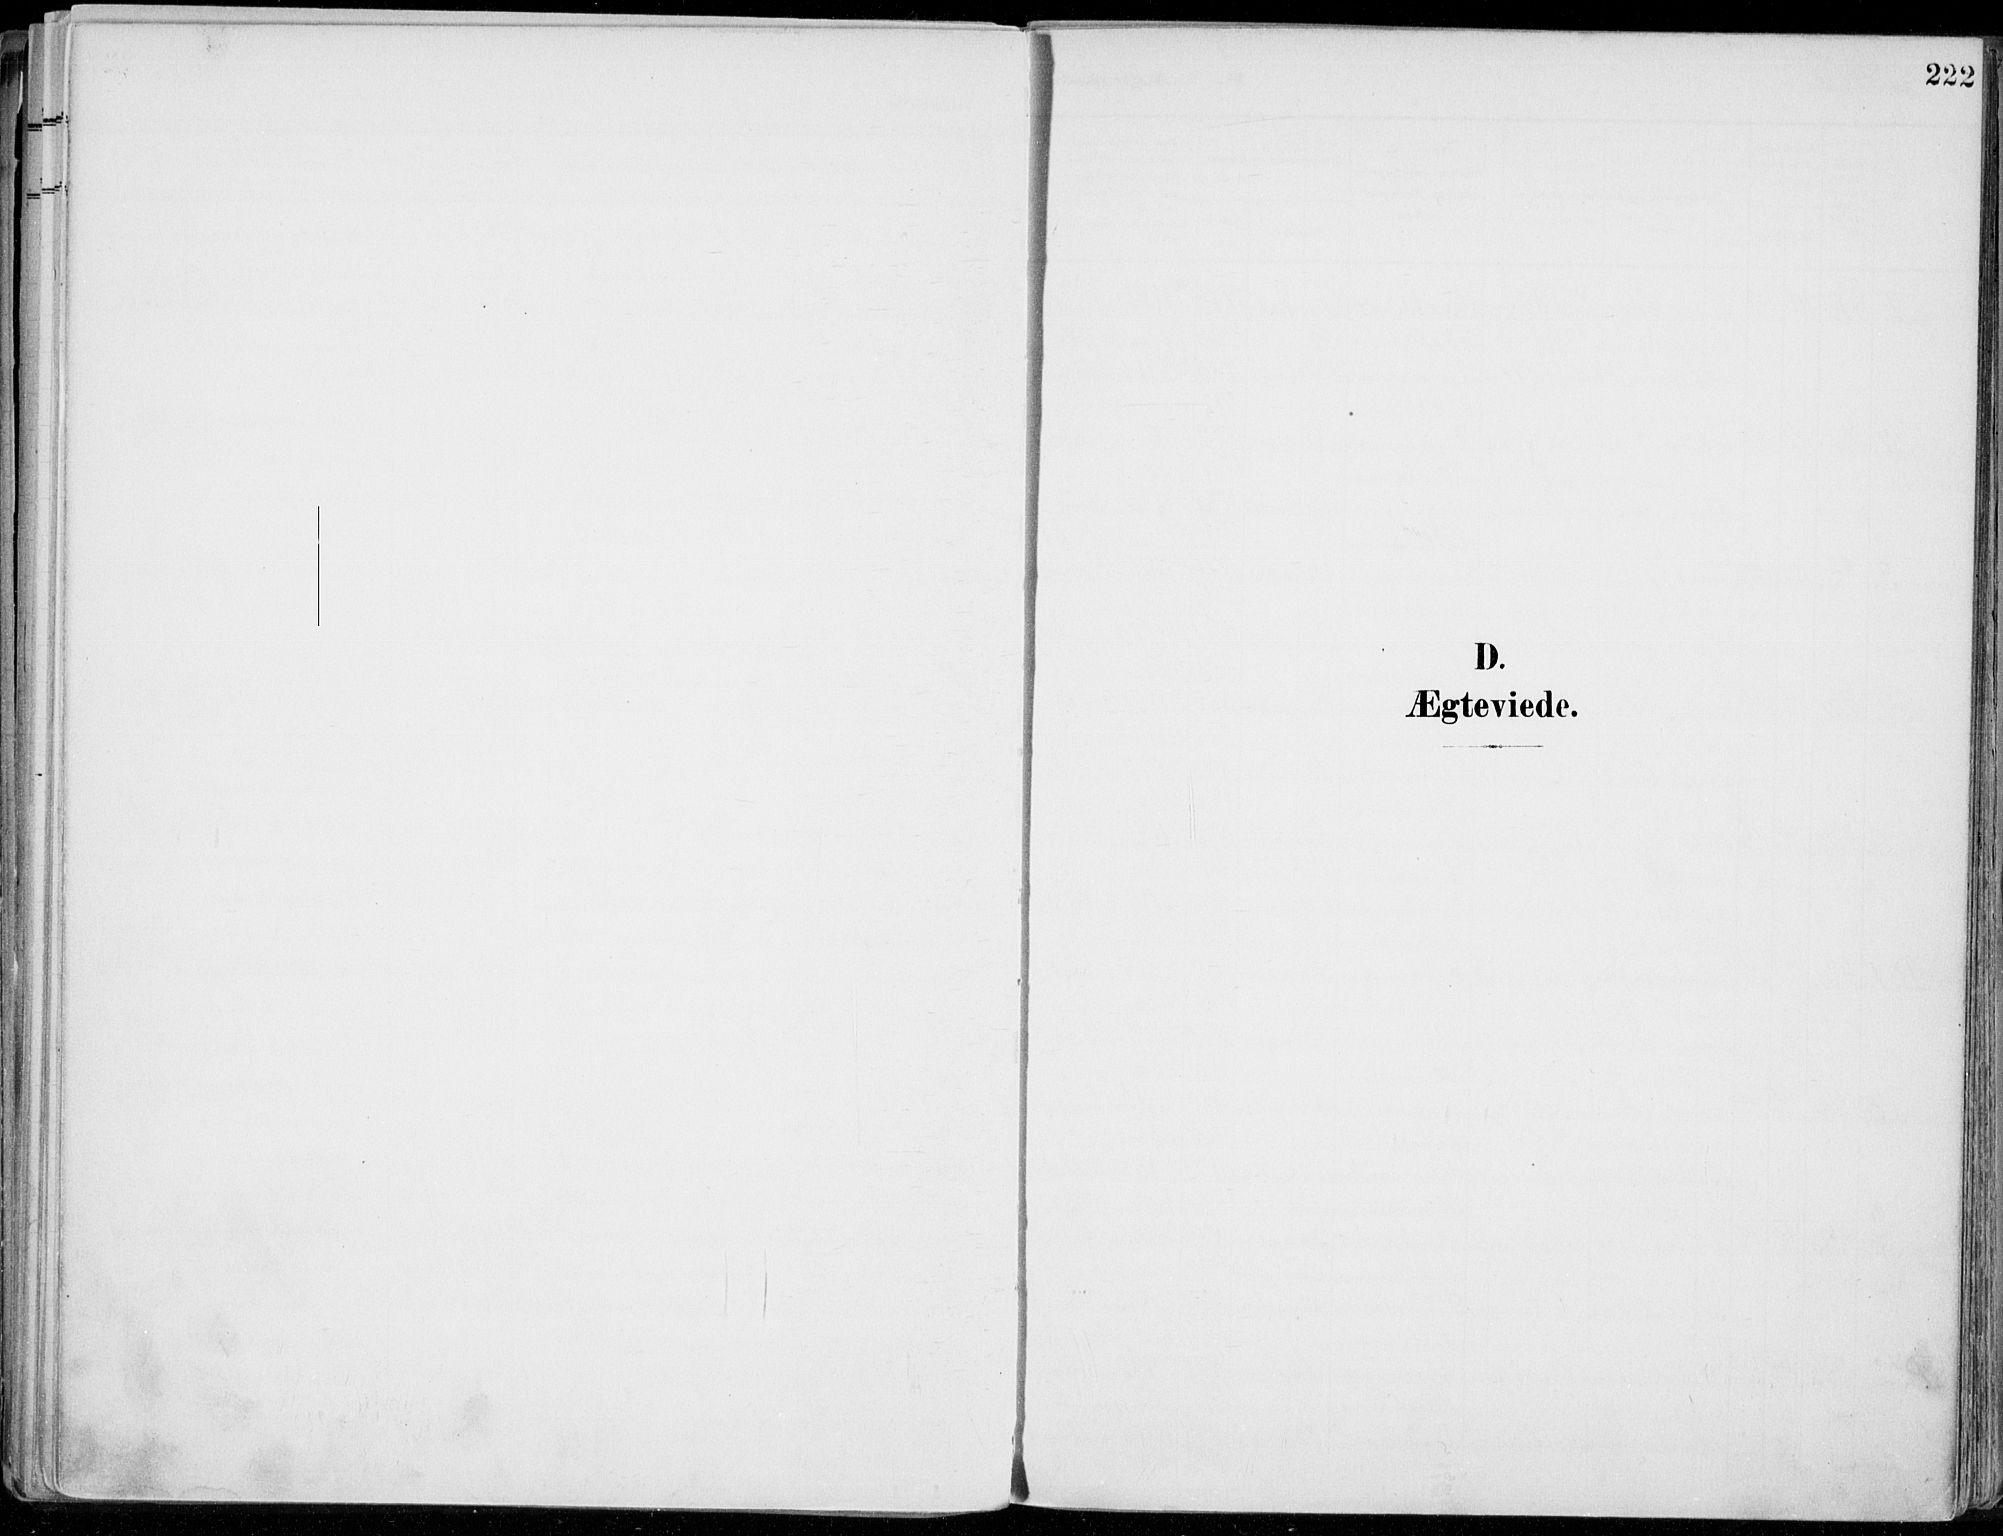 SAH, Lillehammer prestekontor, Ministerialbok nr. 1, 1901-1916, s. 222